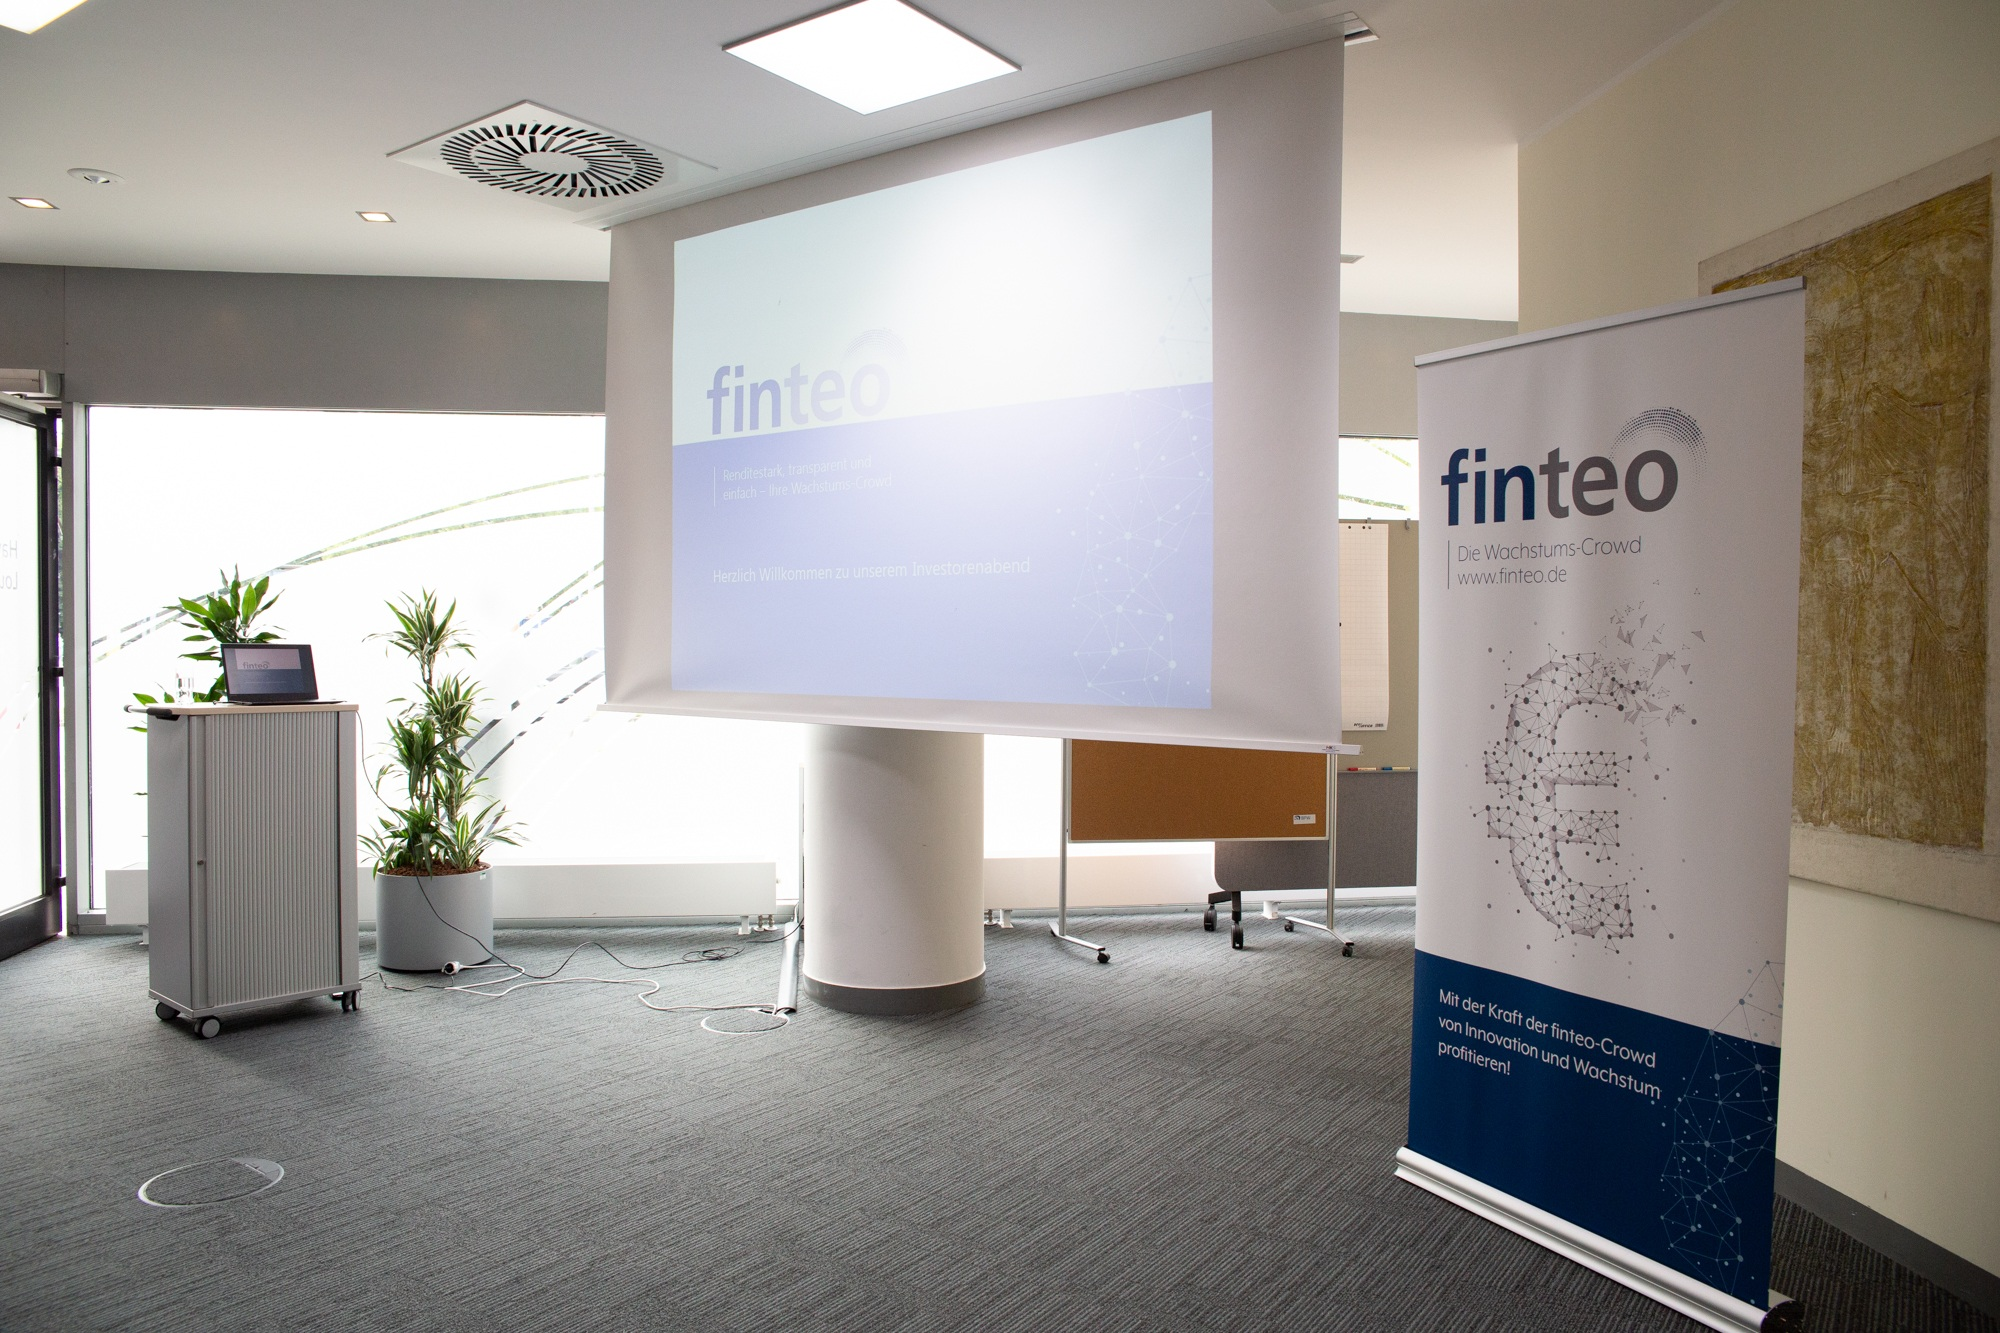 finteo bei Investitionsbank Berlin (IBB)